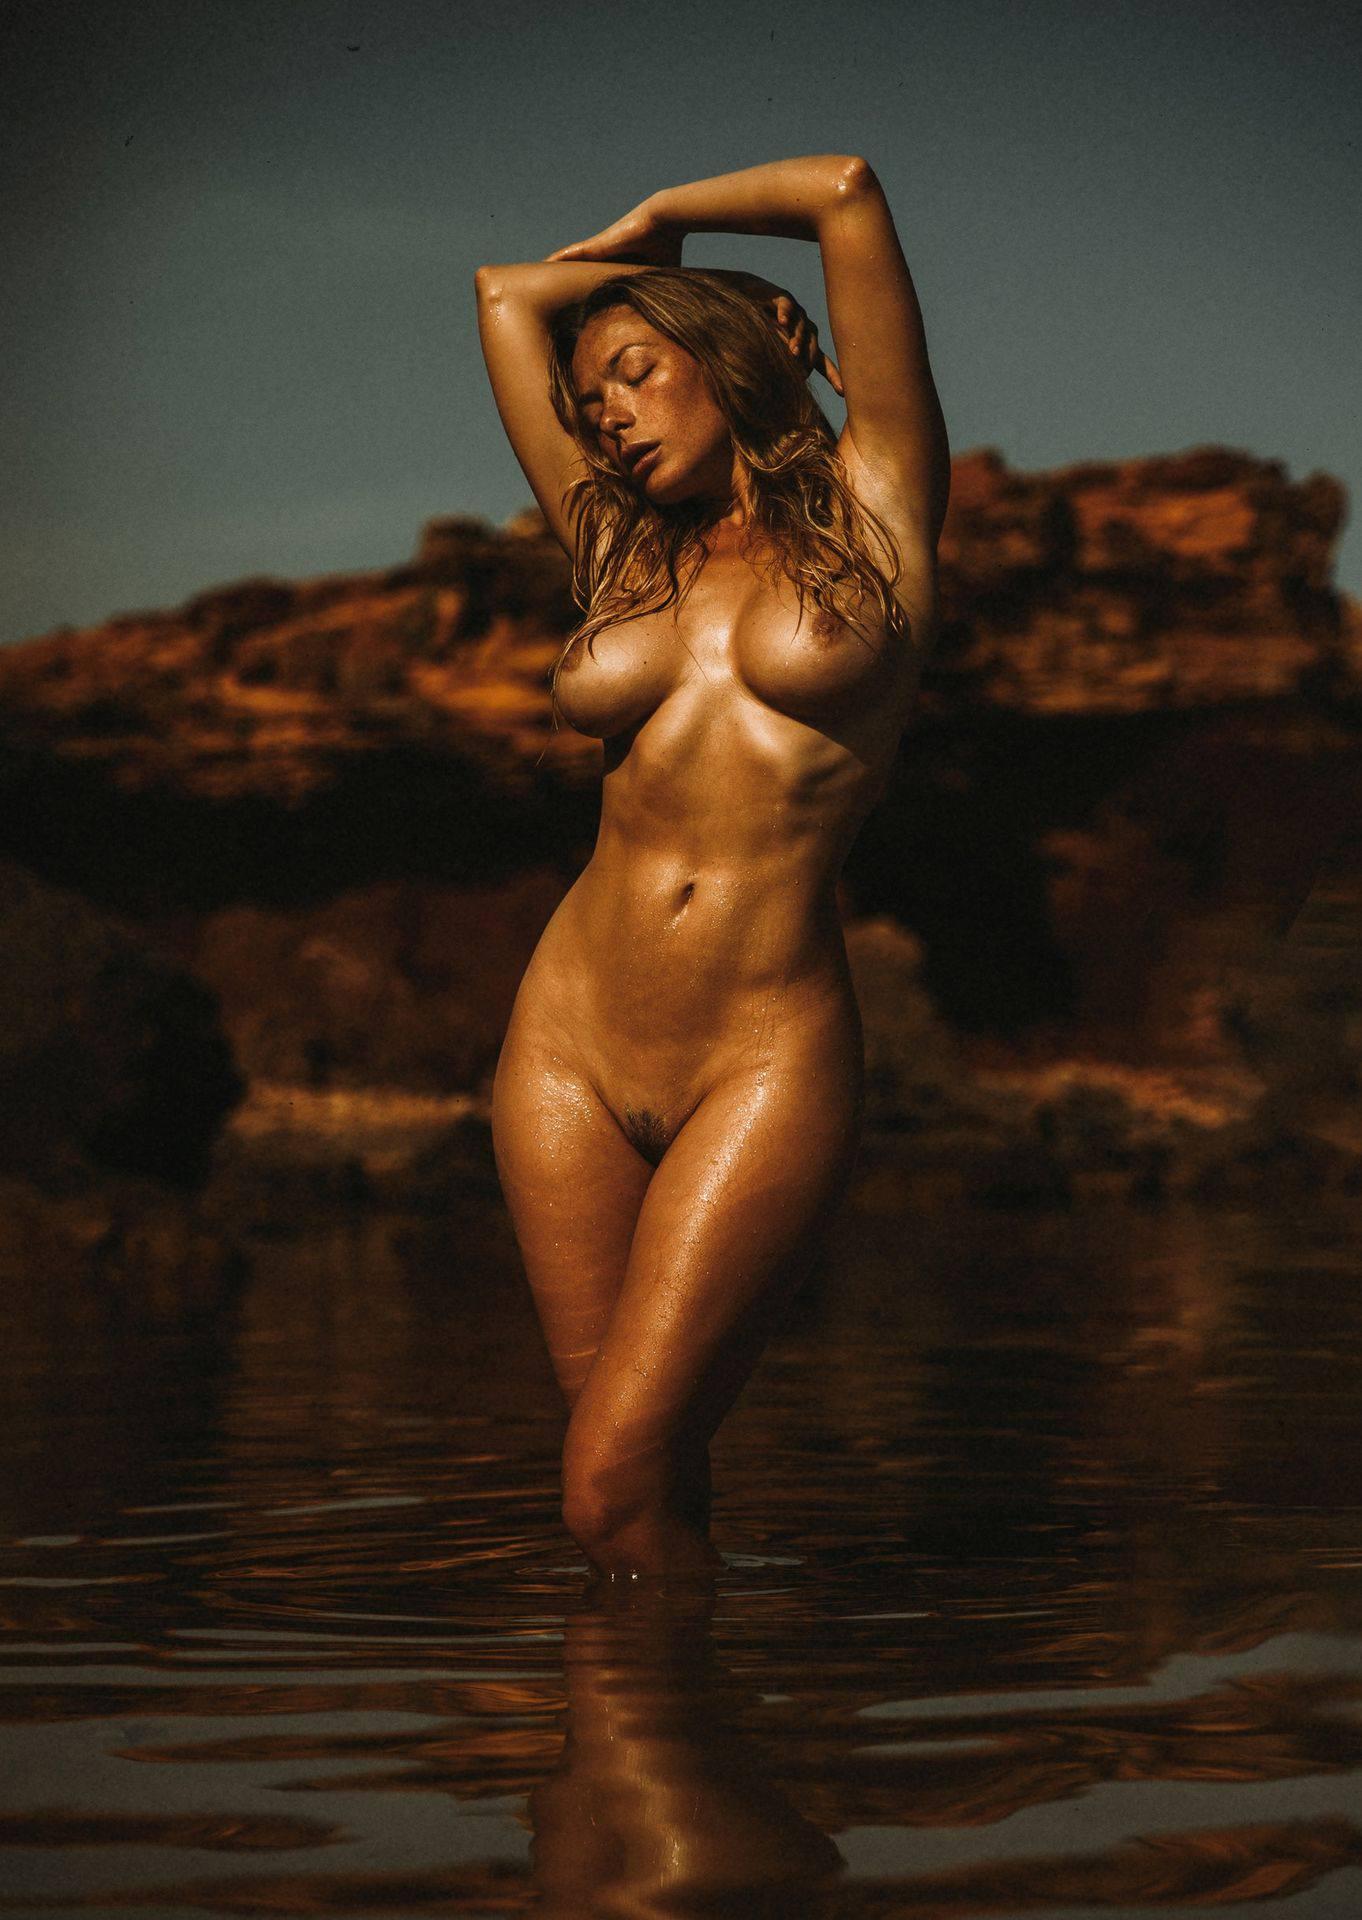 Olga Kobzar – Hot Big Boobs In Sexy Full Frontal Nude Photoshoot By Thomas Agatz (nsfw) 0006